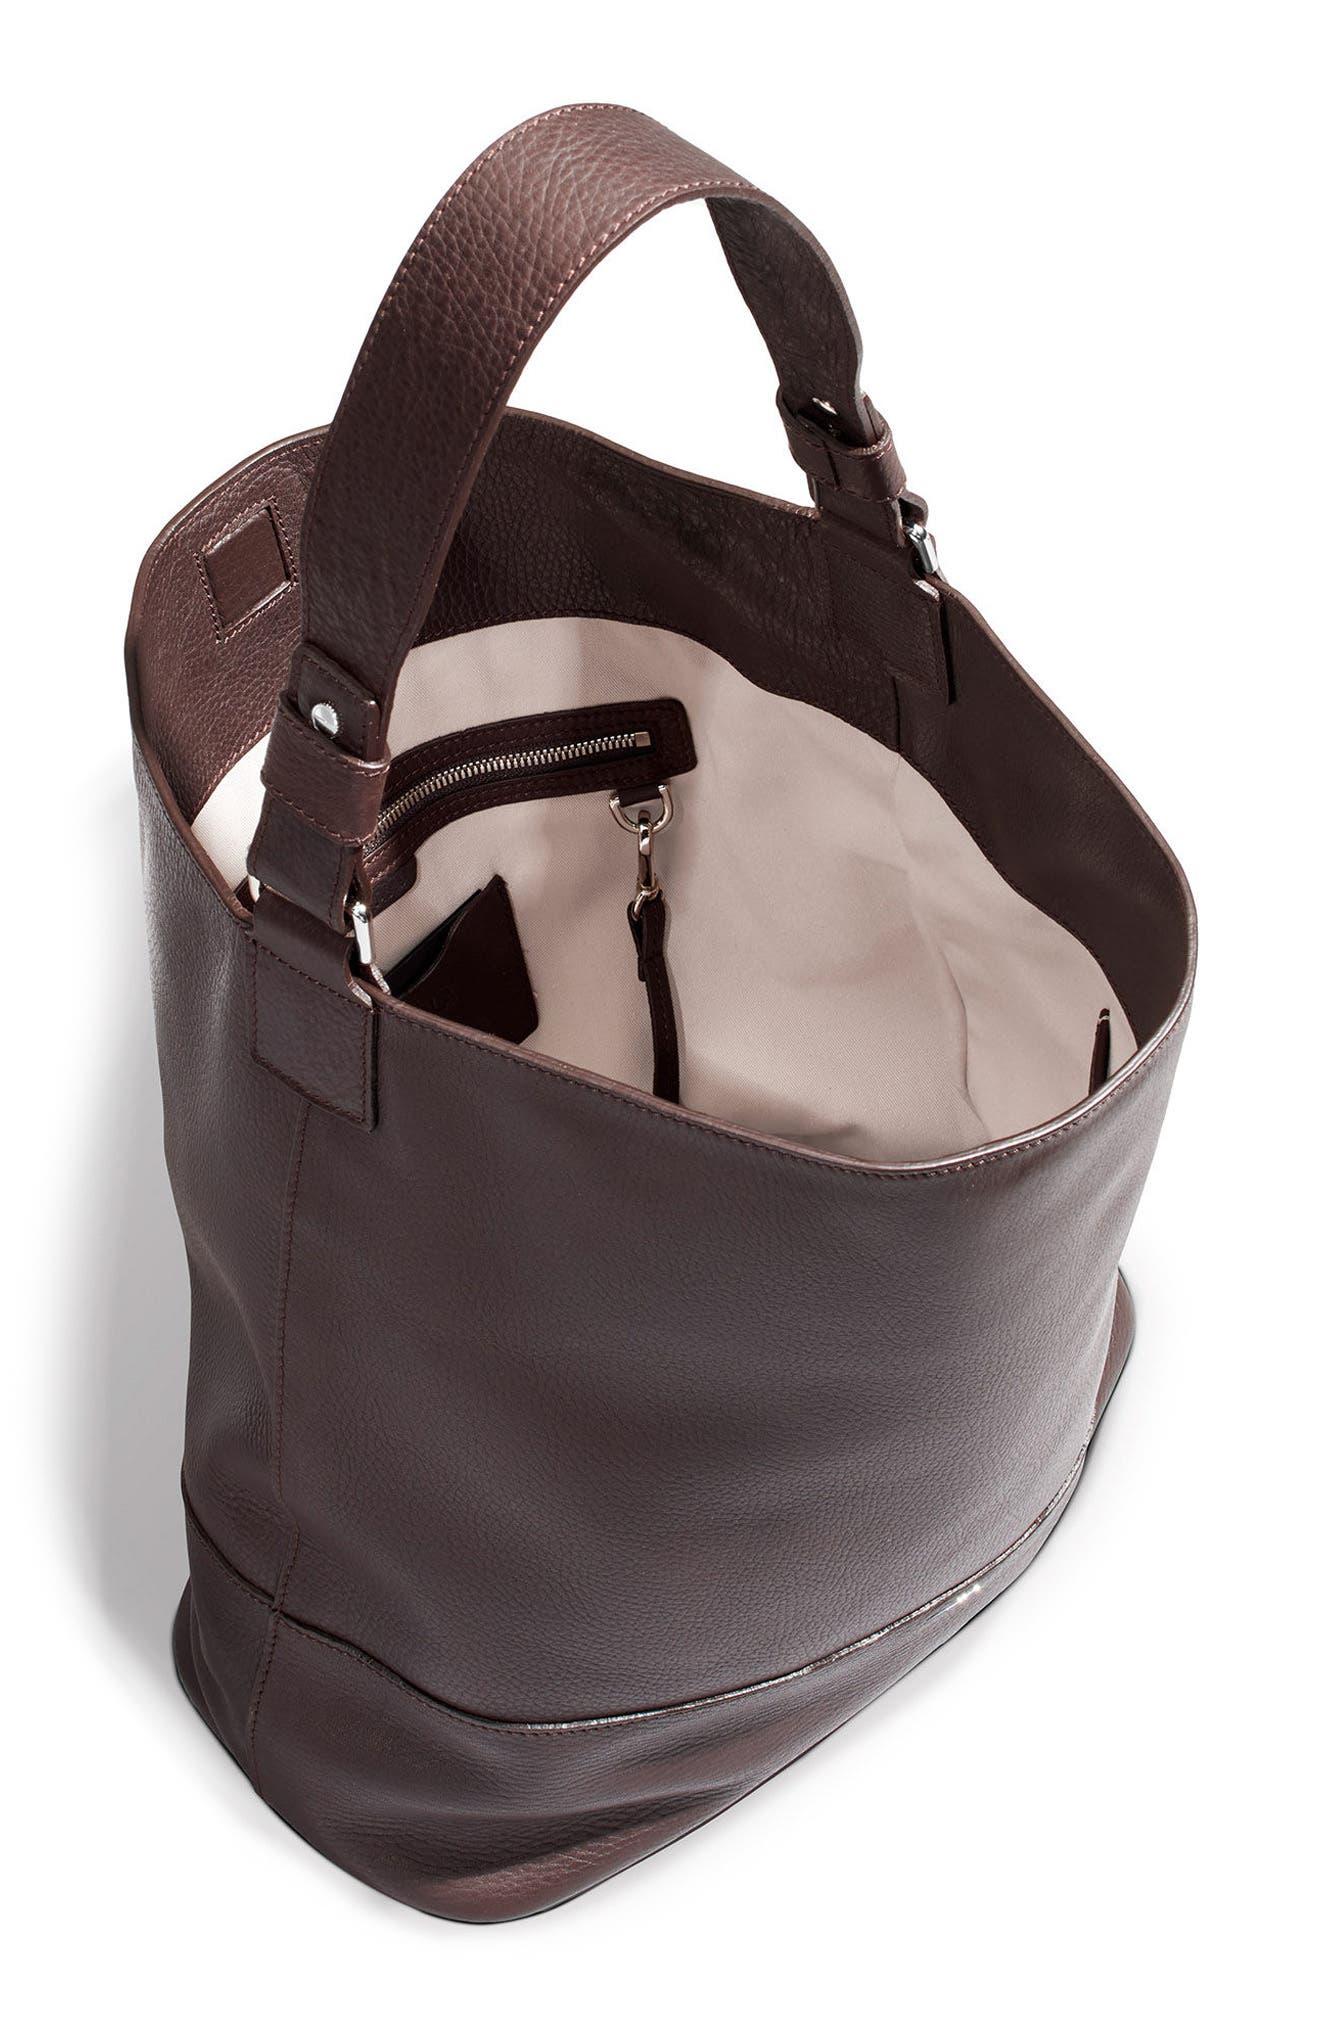 SHINOLA,                             Relaxed Calfskin Leather Hobo Bag,                             Alternate thumbnail 7, color,                             240